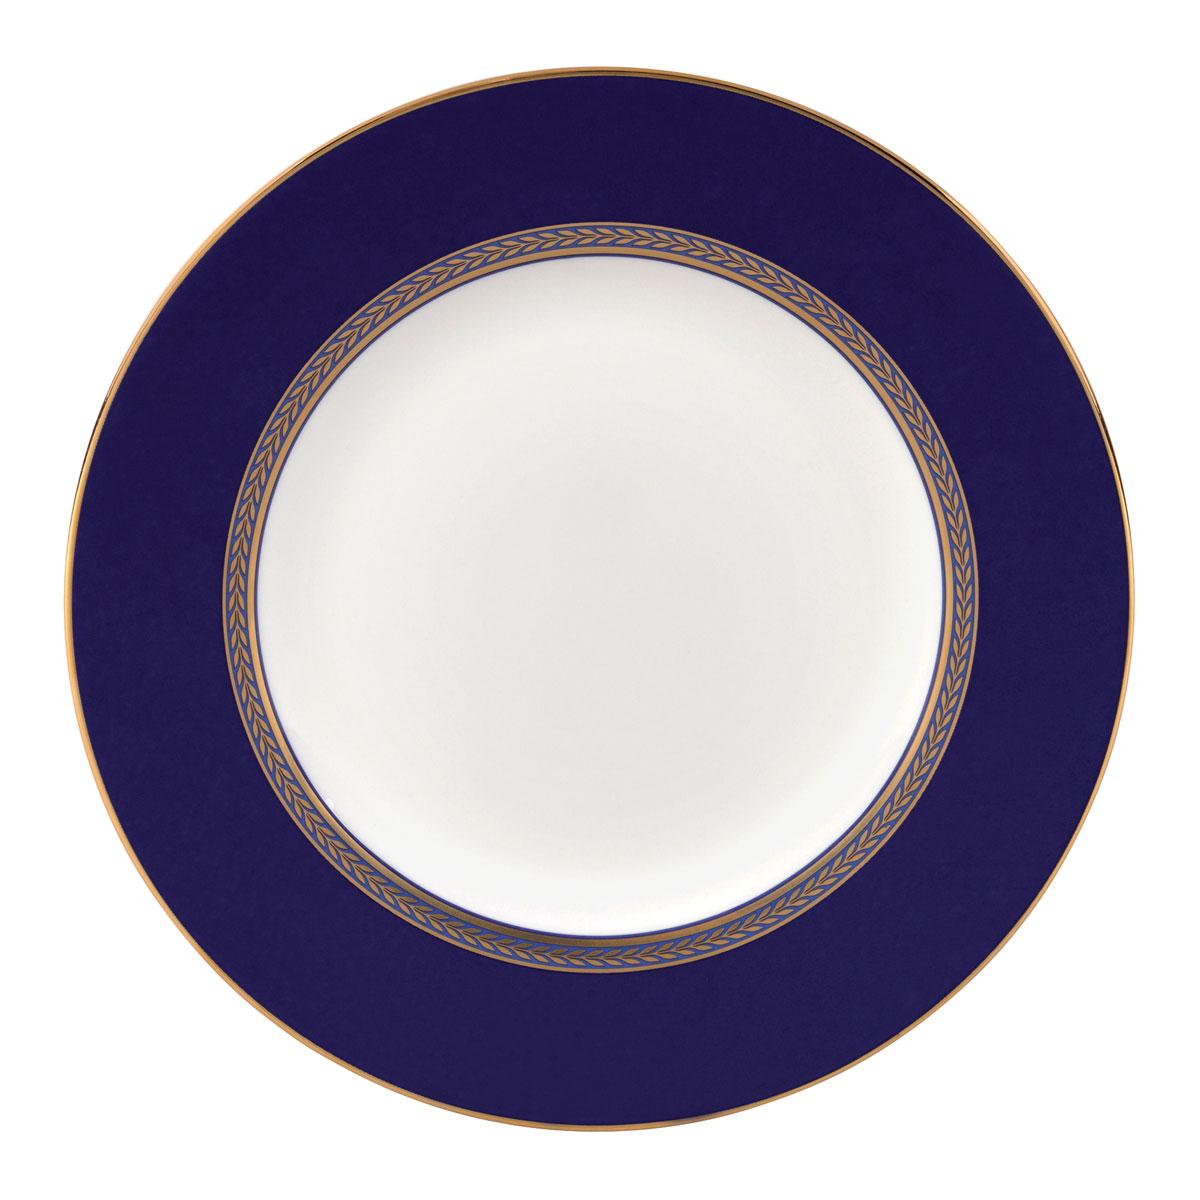 "Wedgwood Renaissance Gold Salad Plate 8"", Single"